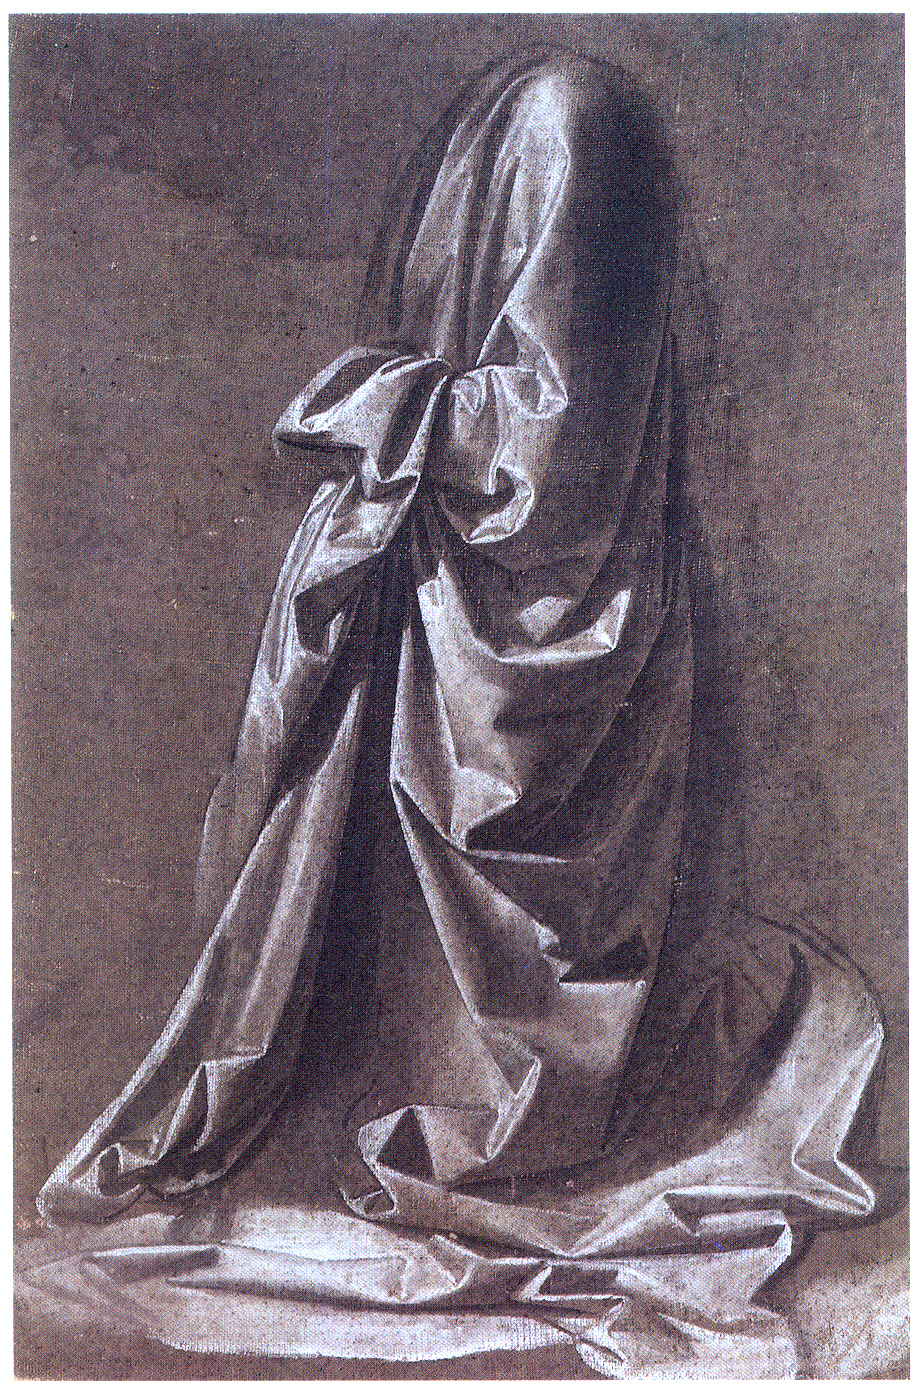 Leonardo da Vinci Artwork, Anatomical, Painting, History, Human, HQ Photo